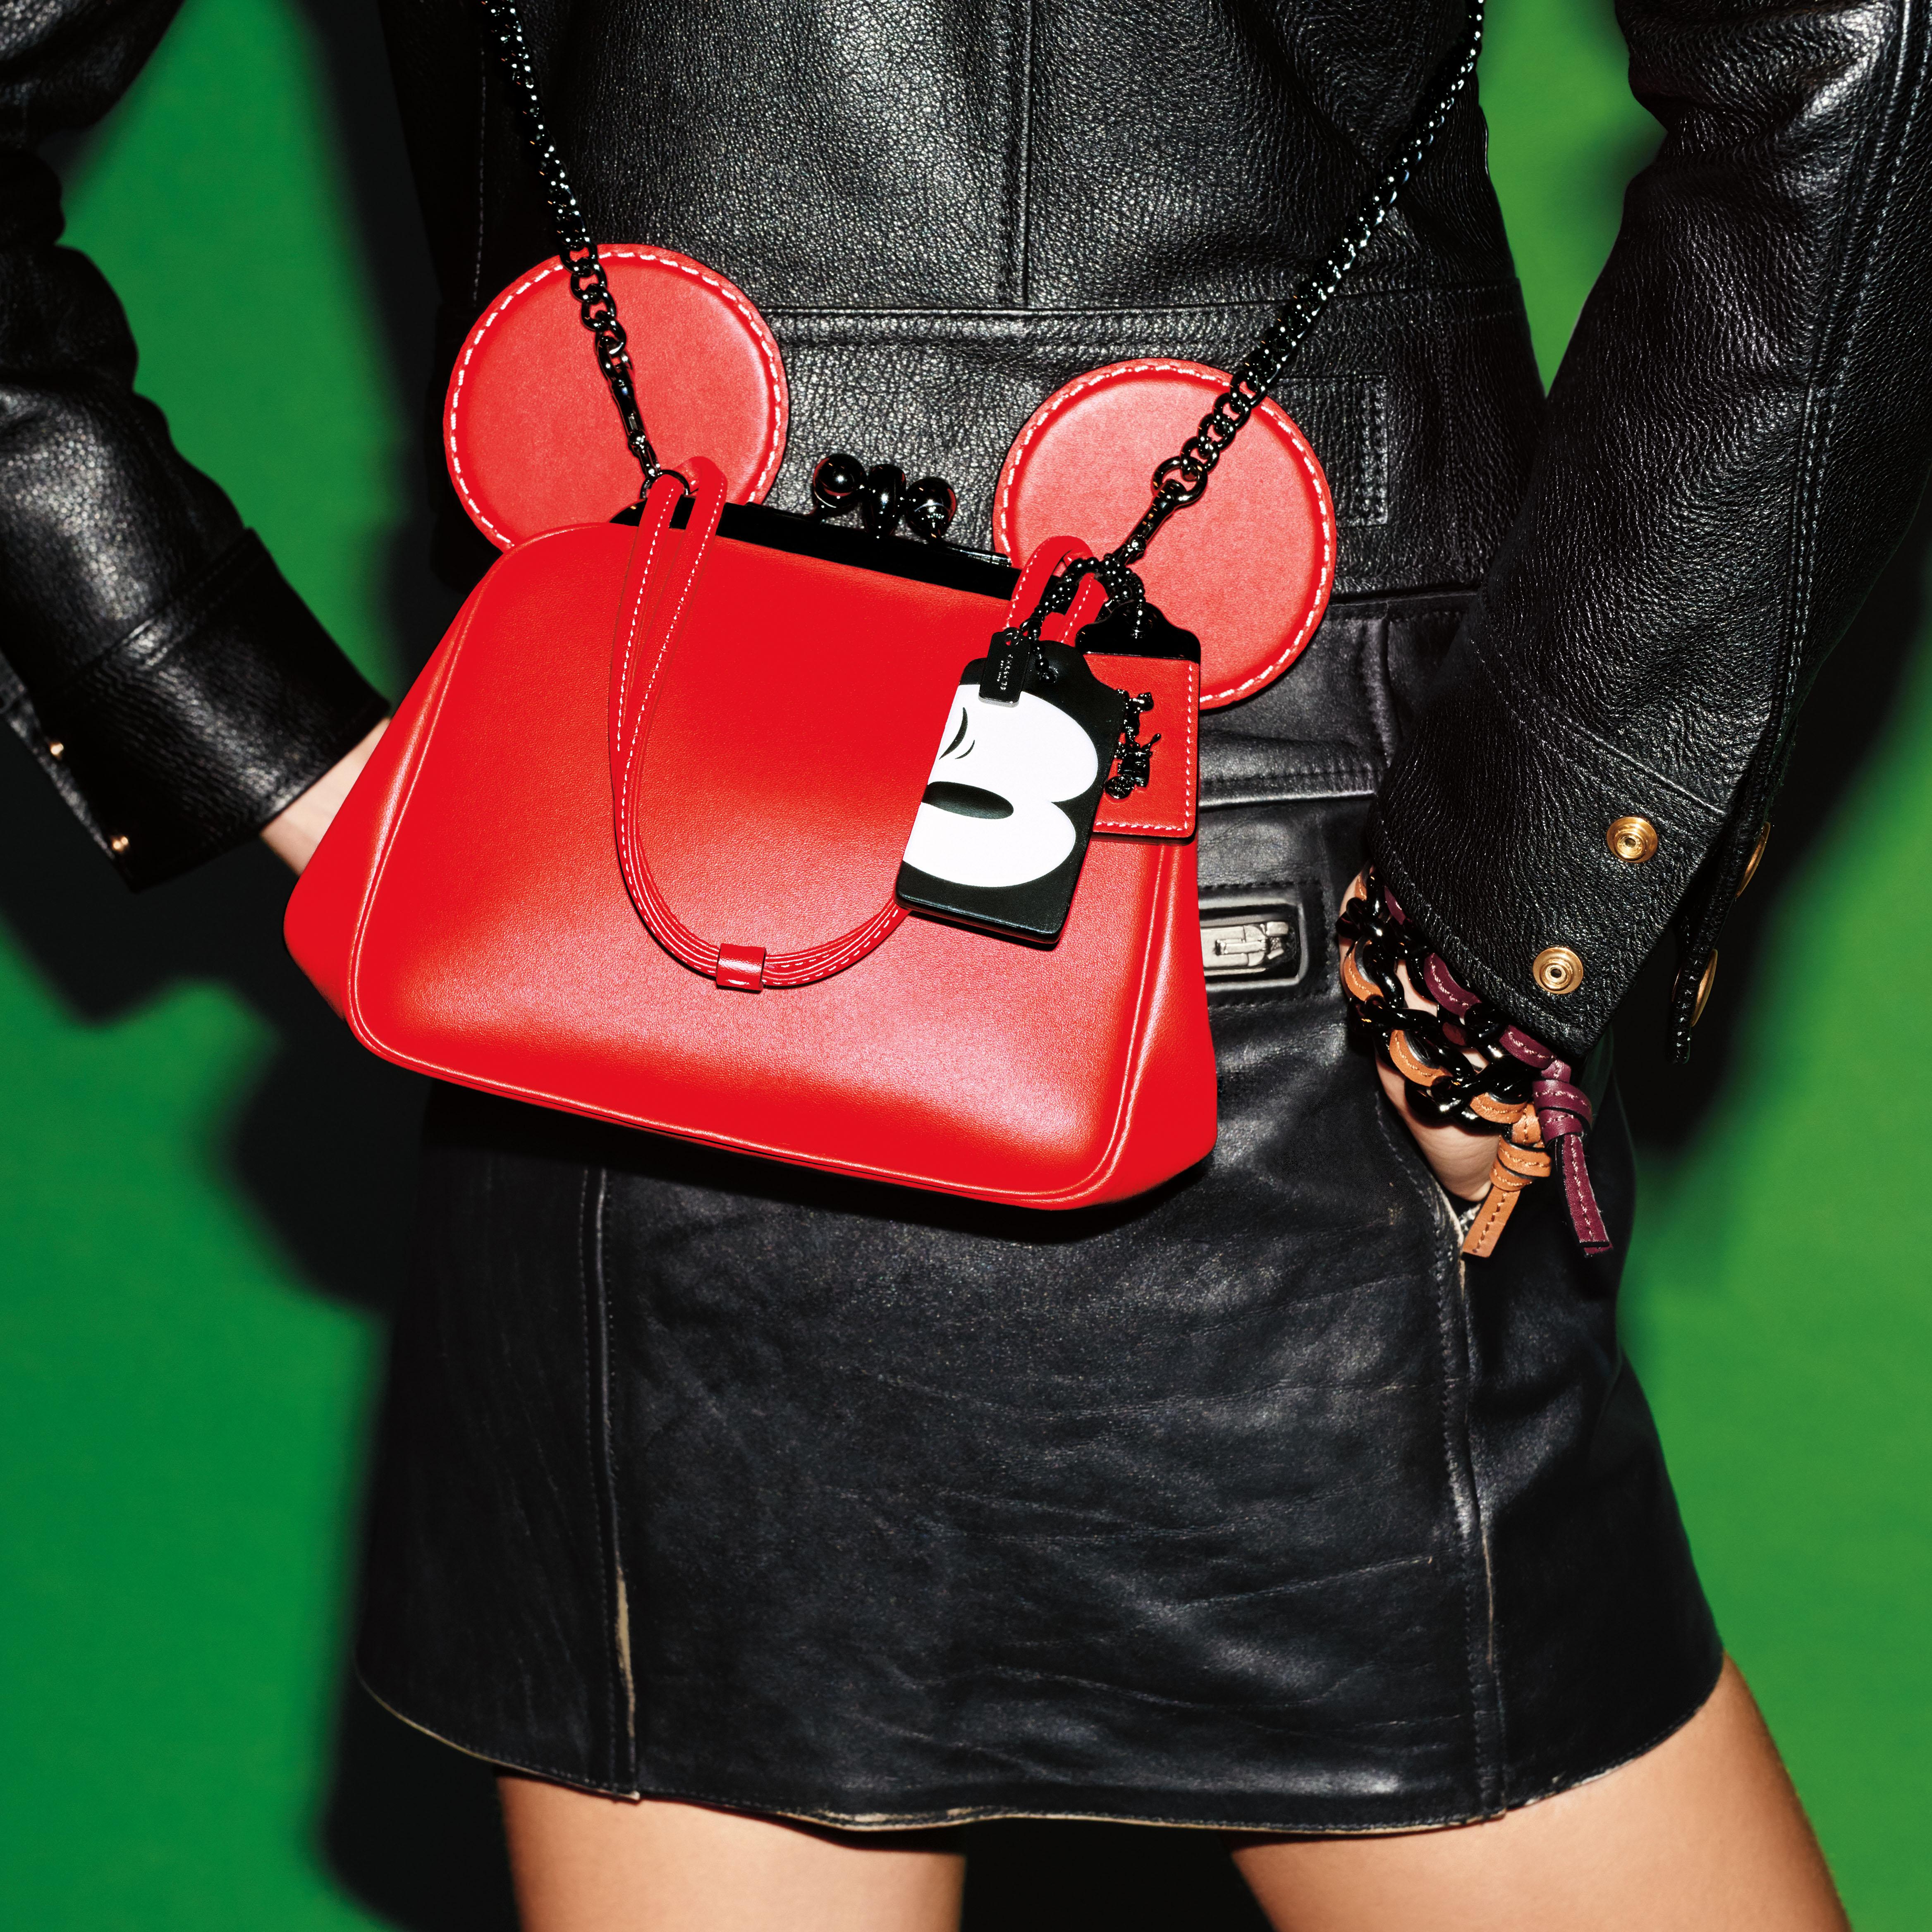 Coach x Disney 'Kisslock' bag, $395.